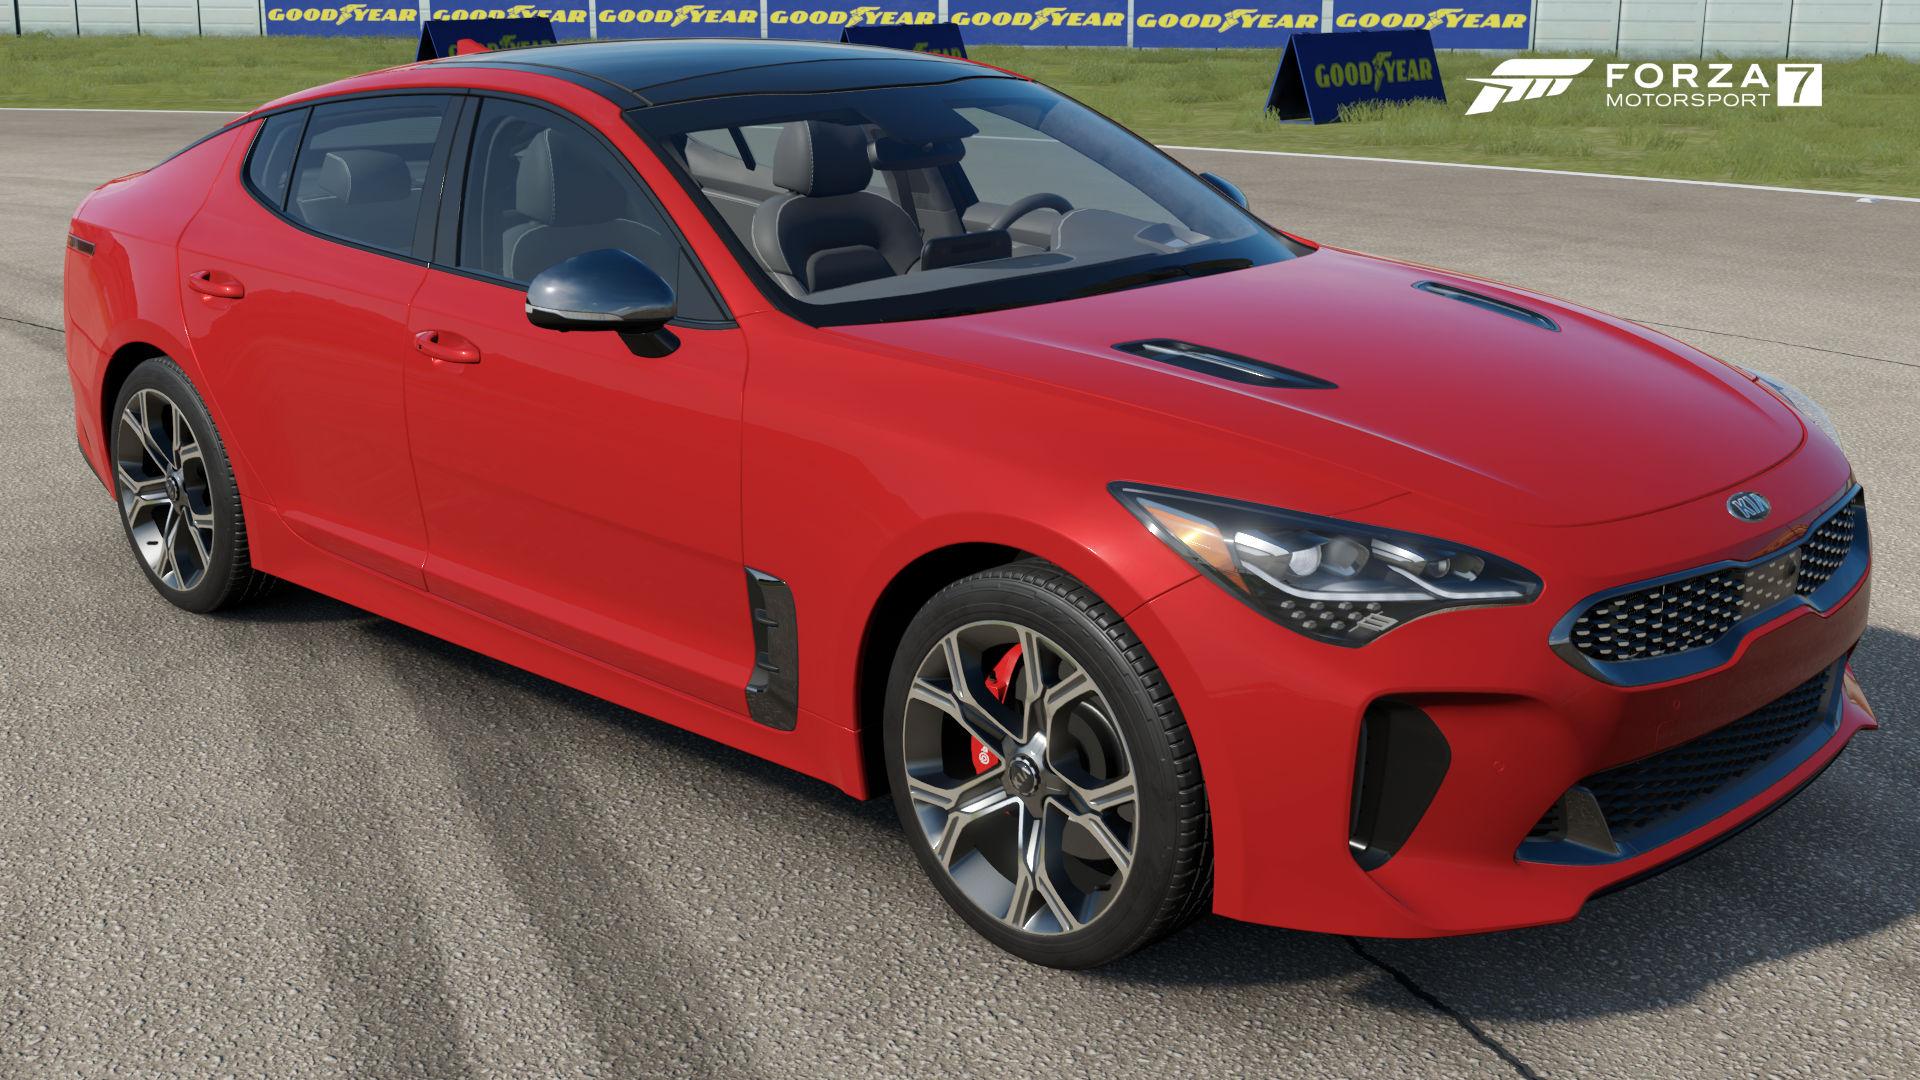 sports news roadshow kia bargain is stinger performance promo car at a